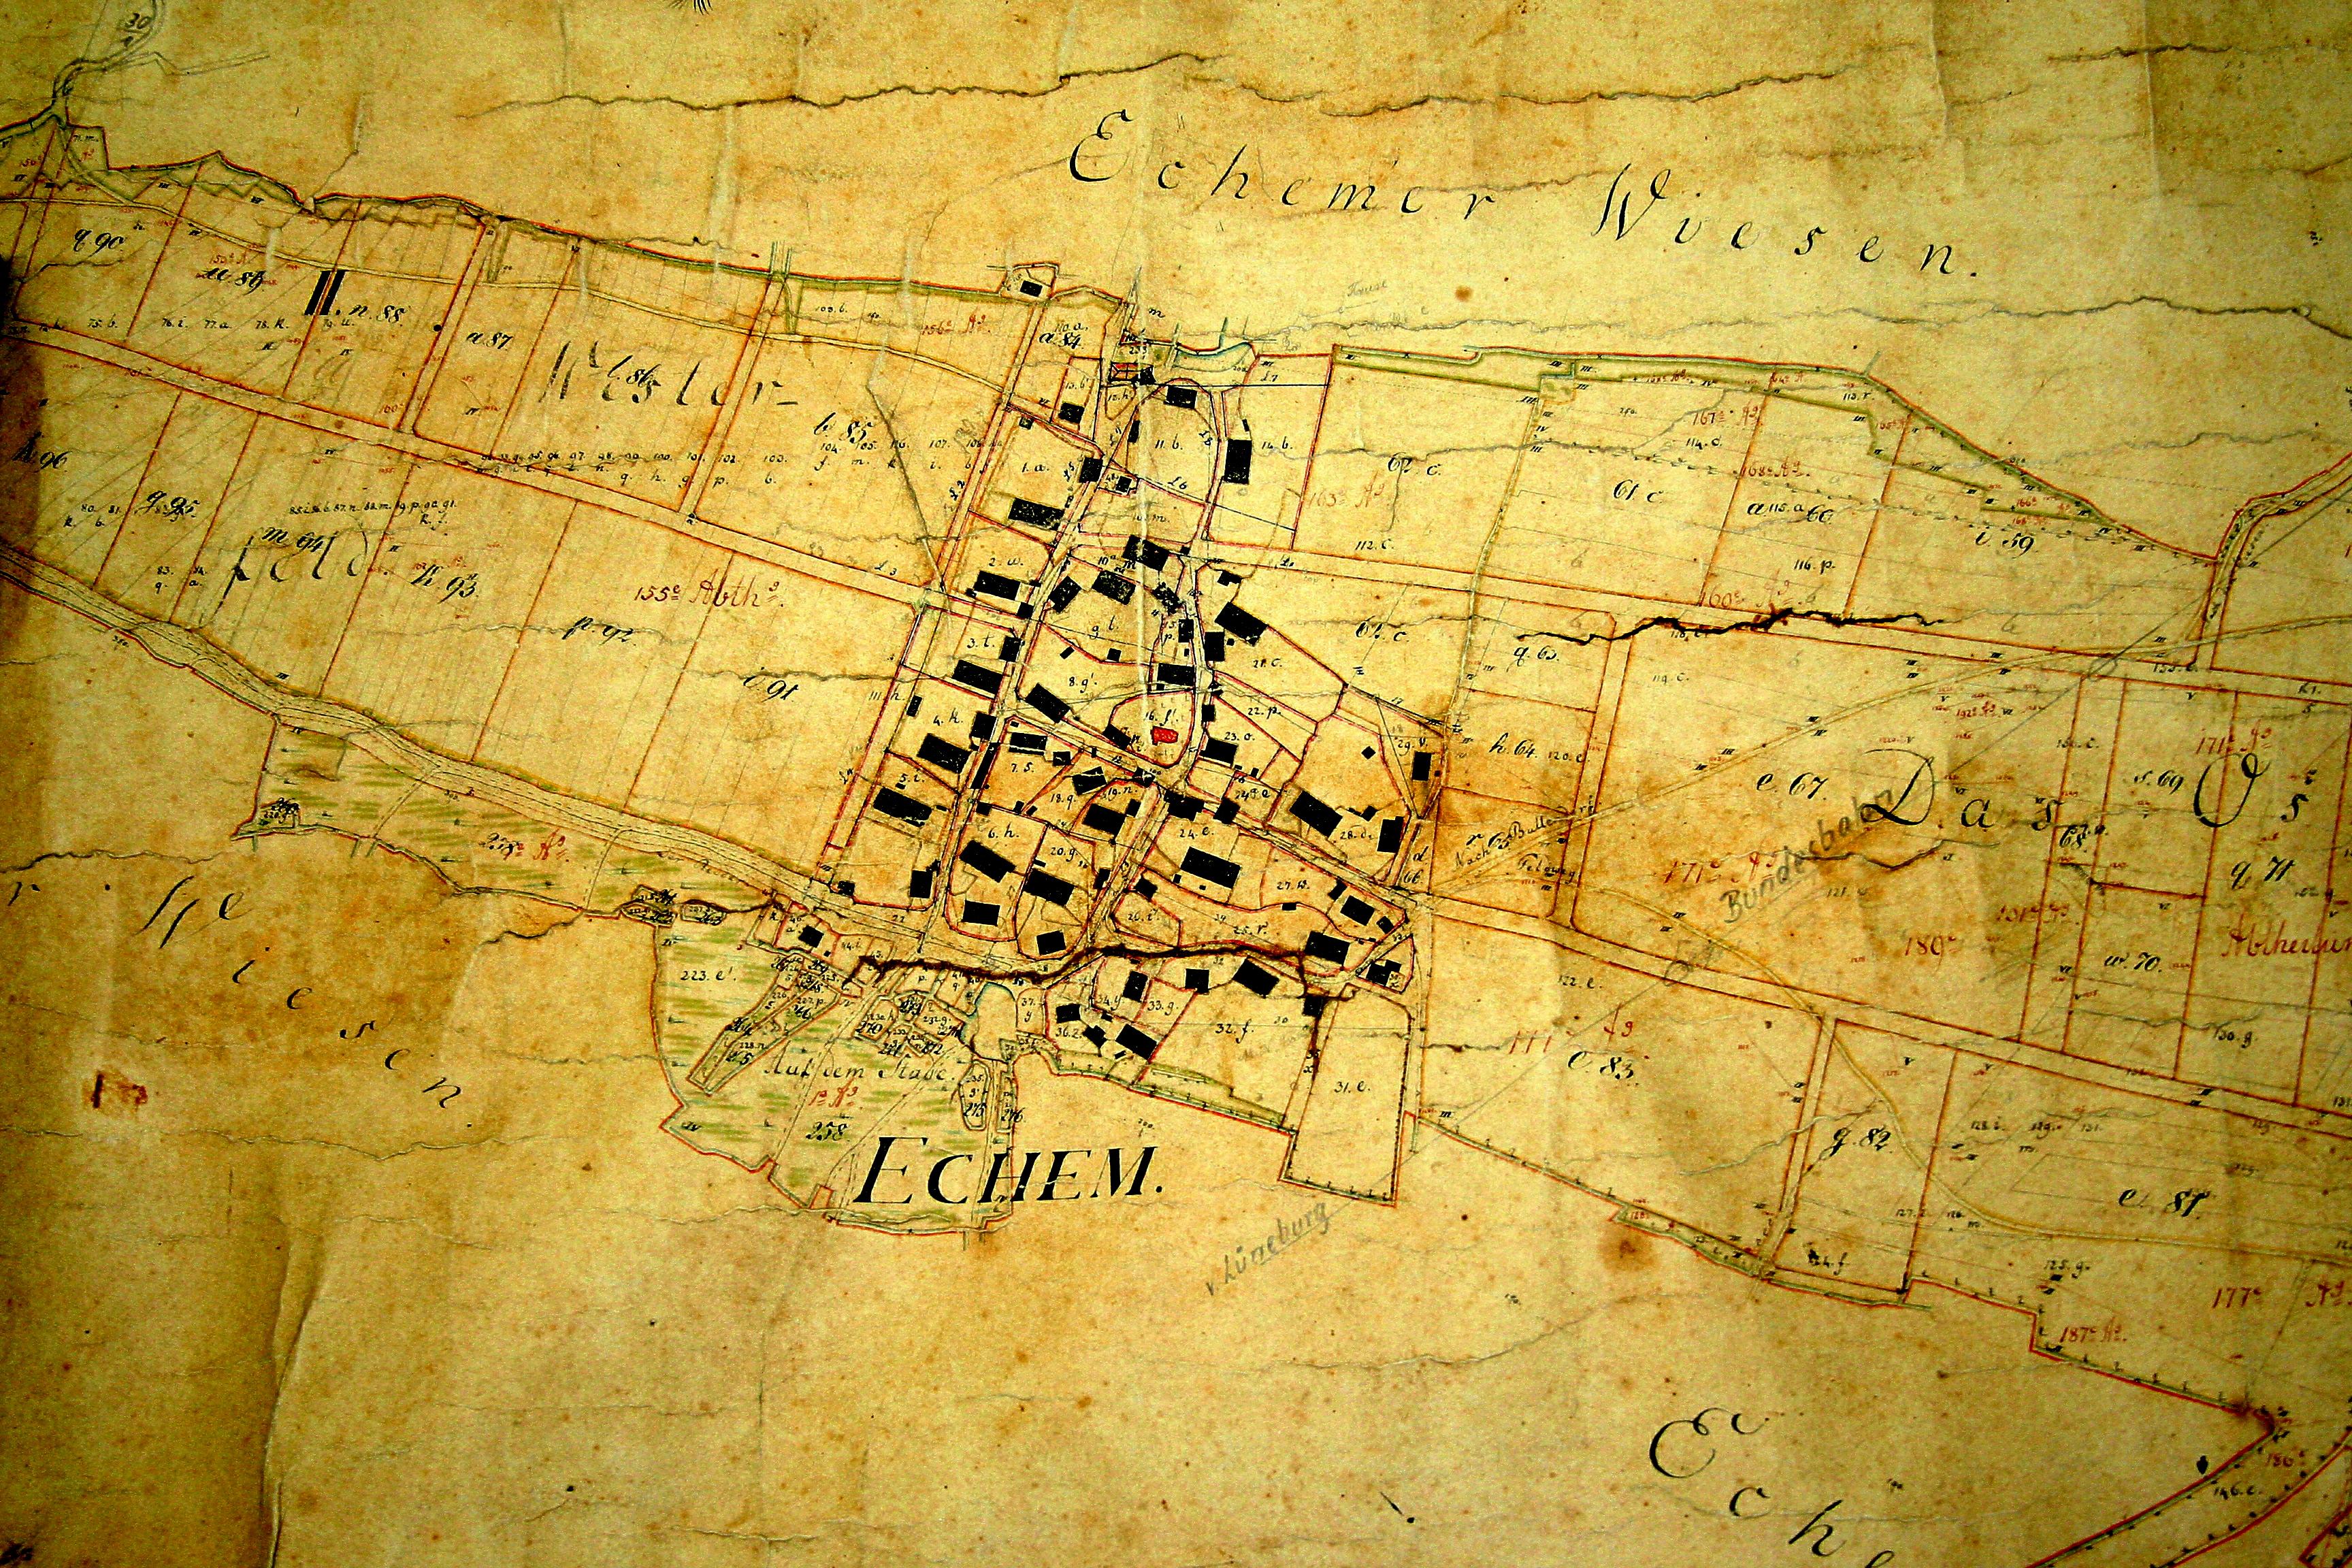 dorflage-echem-verkoppelung-1822